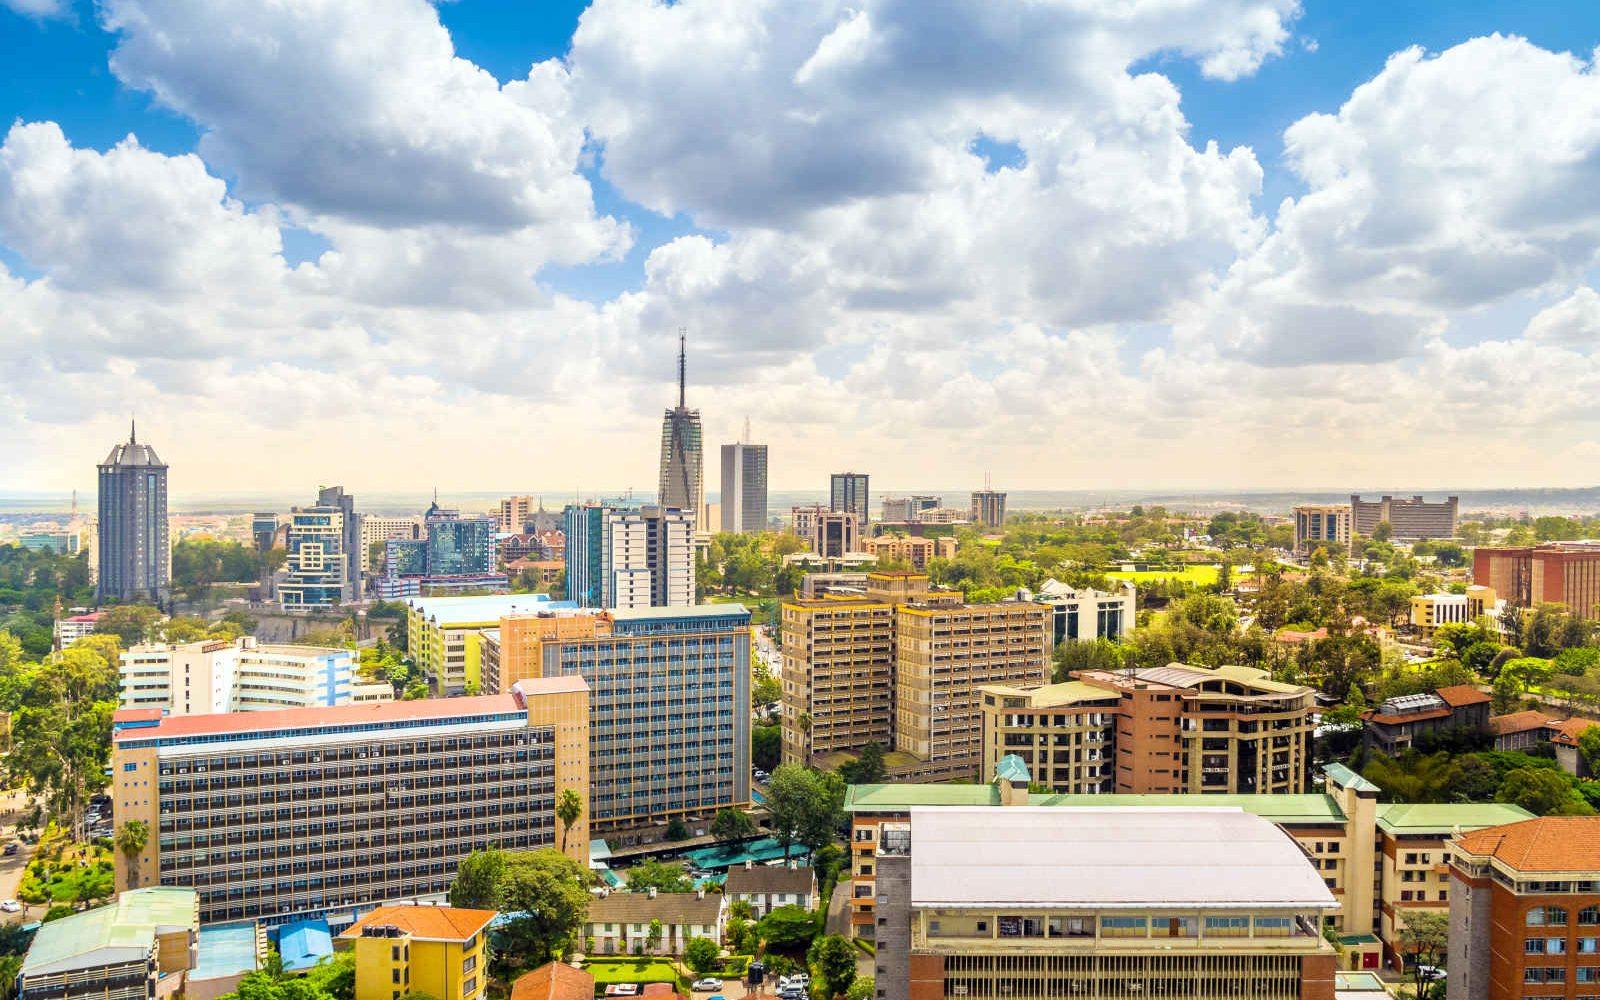 Skyline, Nairobi, Kenya